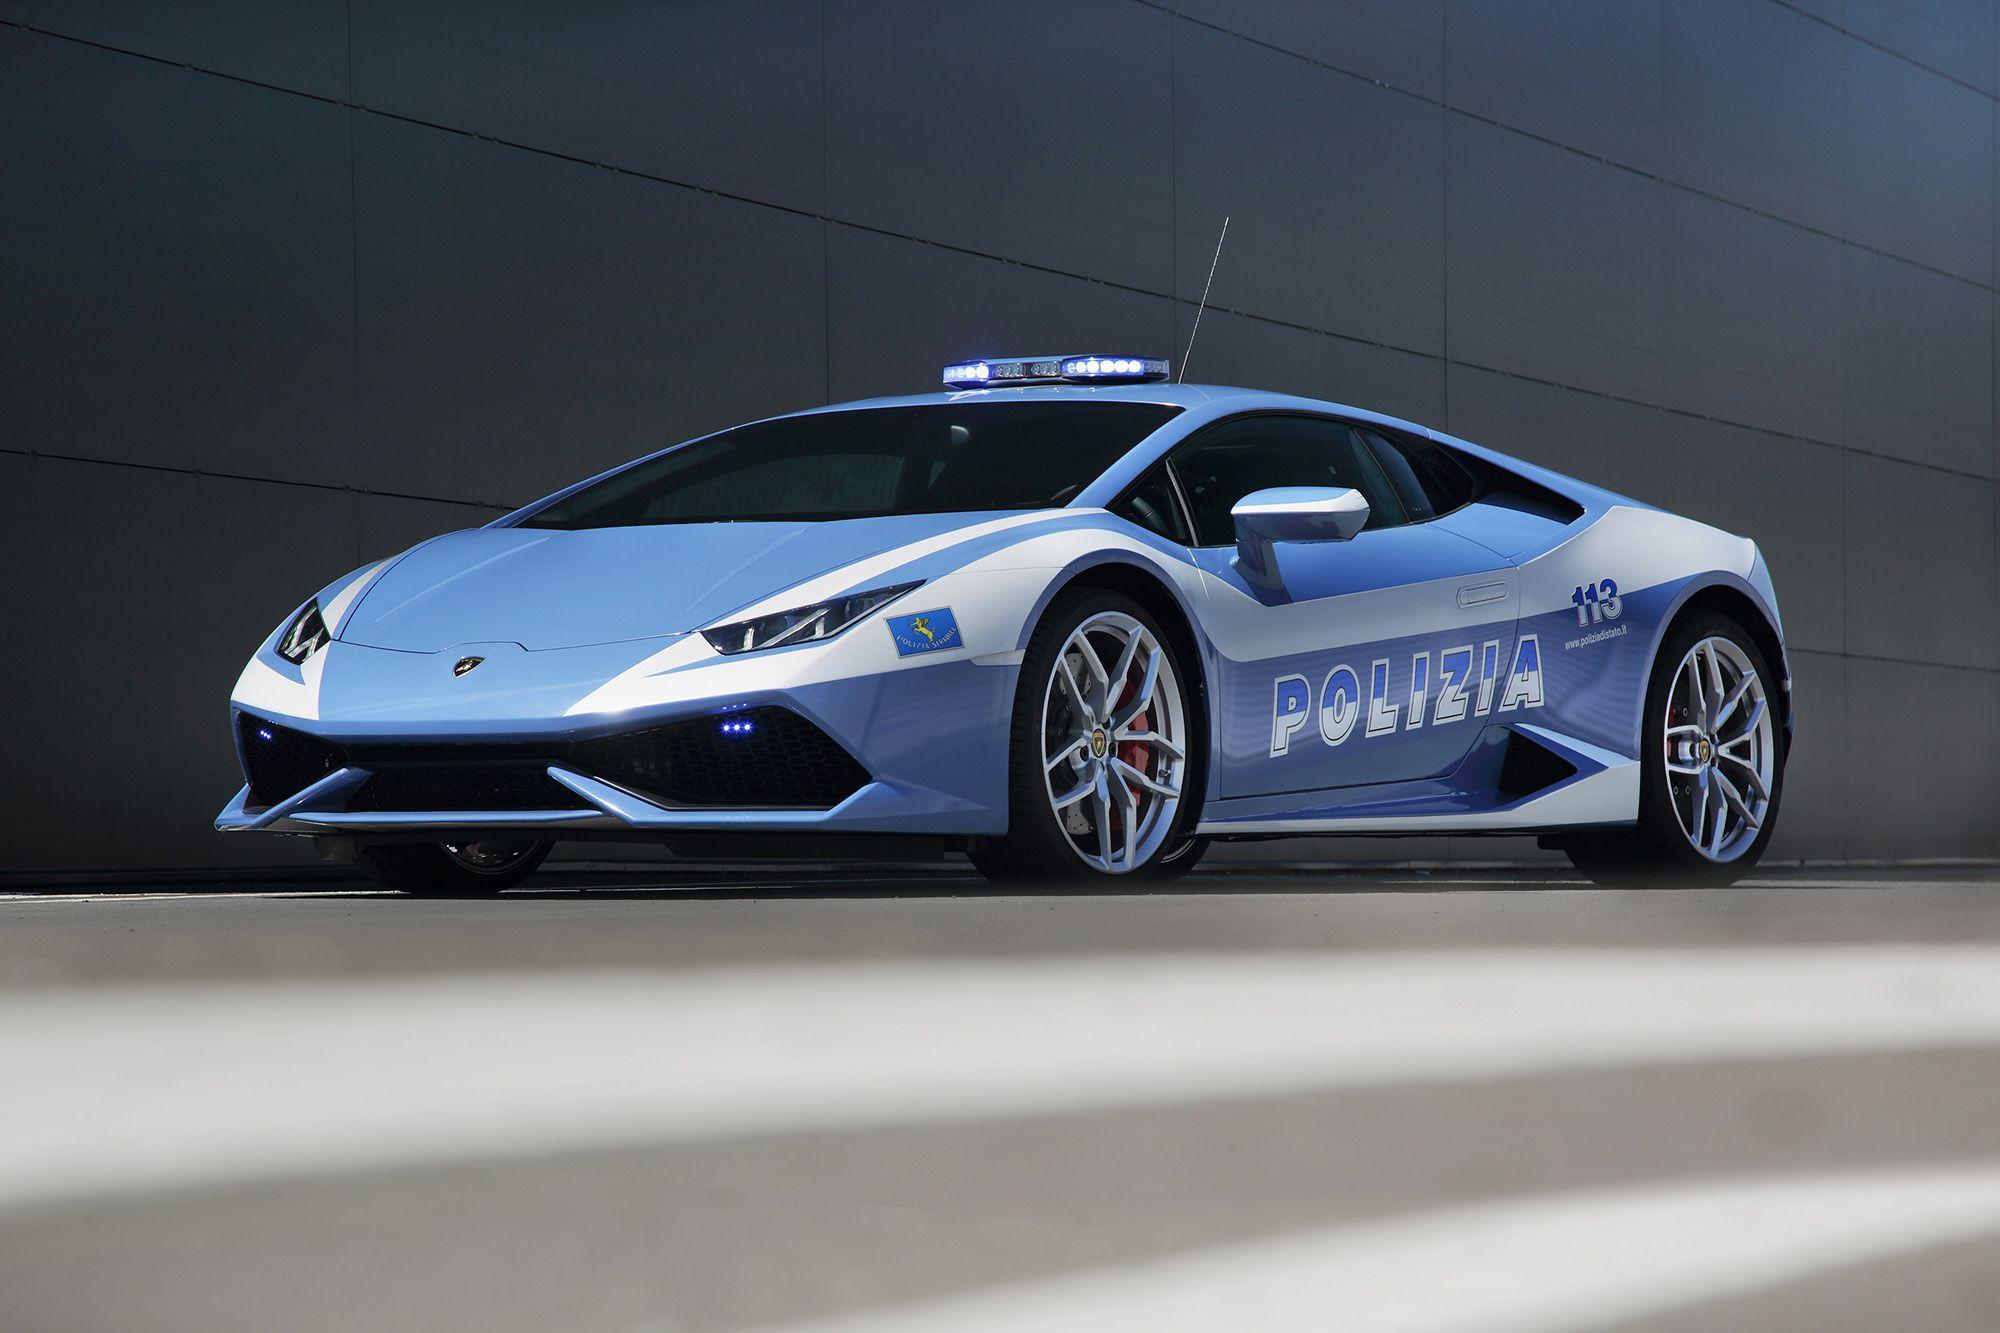 Lamborghini Huracan donated to Italian State Police fleet s